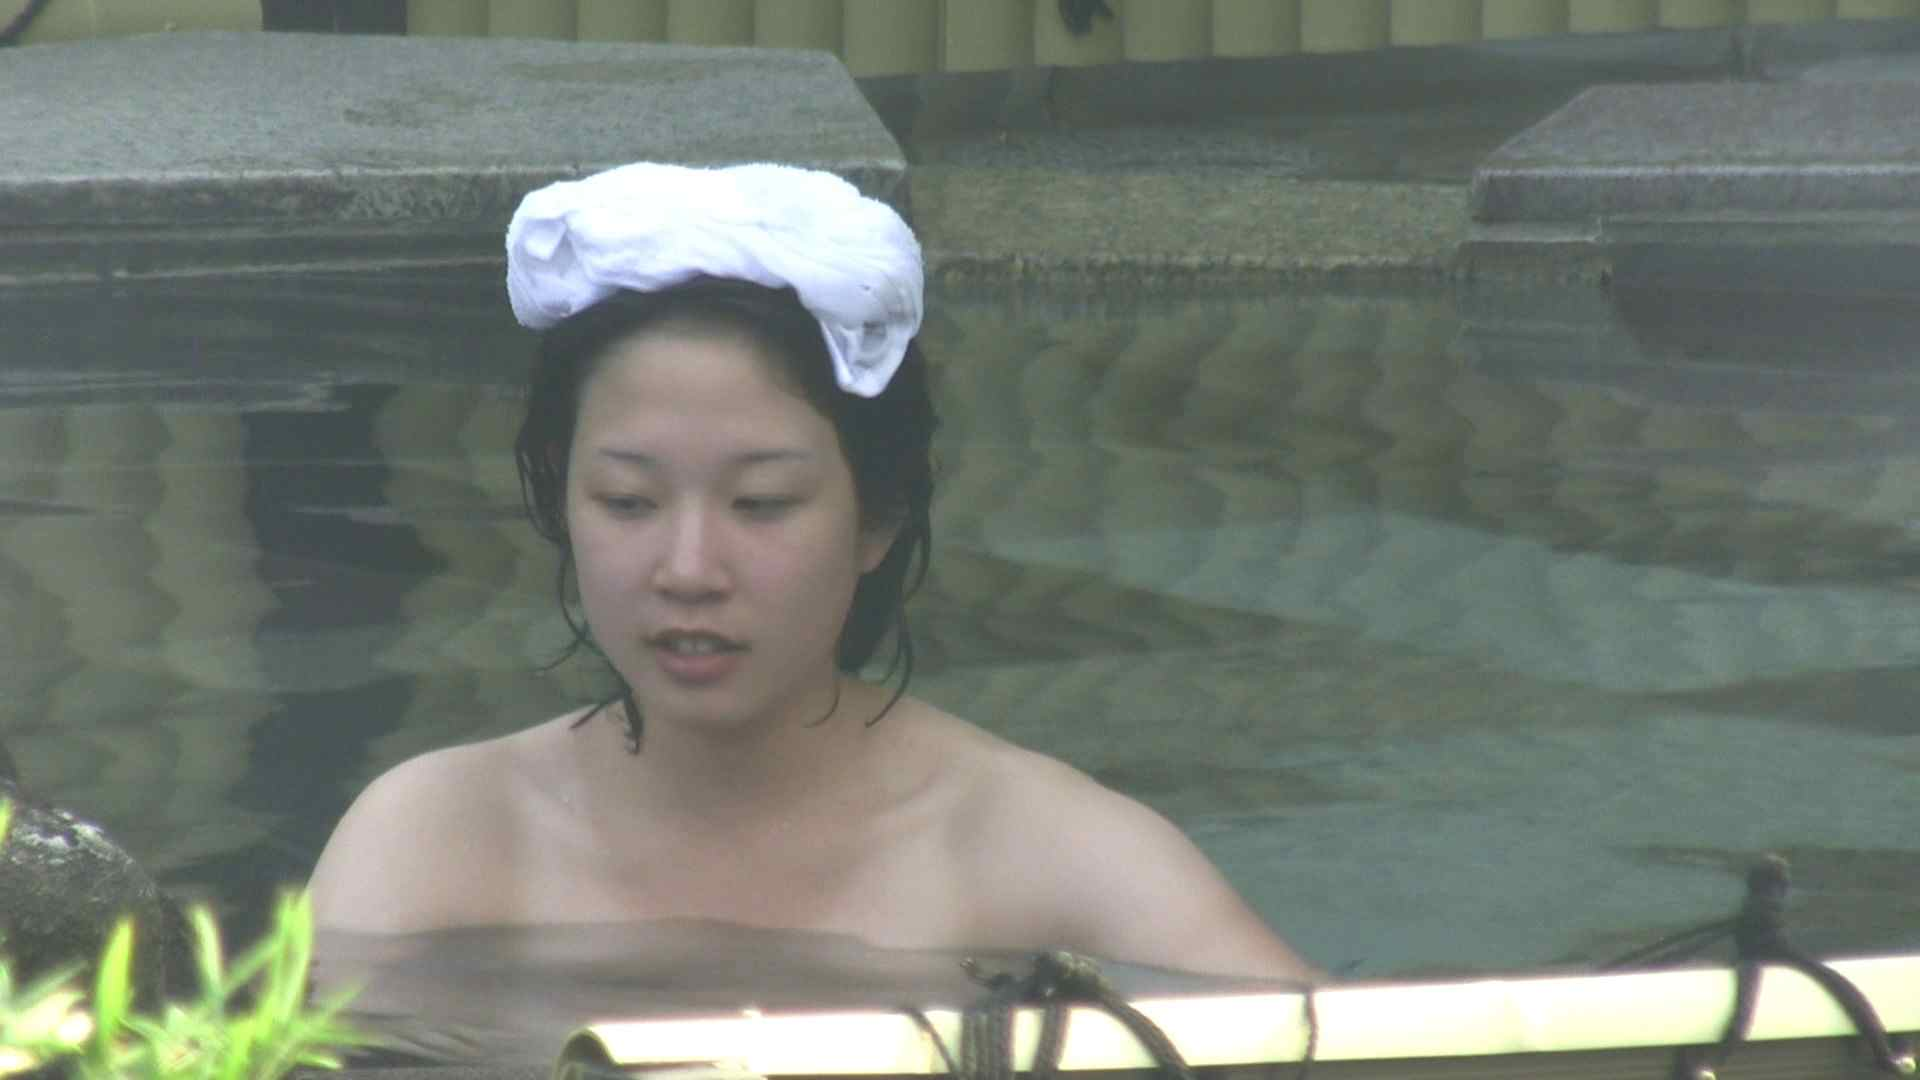 Aquaな露天風呂Vol.172 盗撮   HなOL  55pic 55